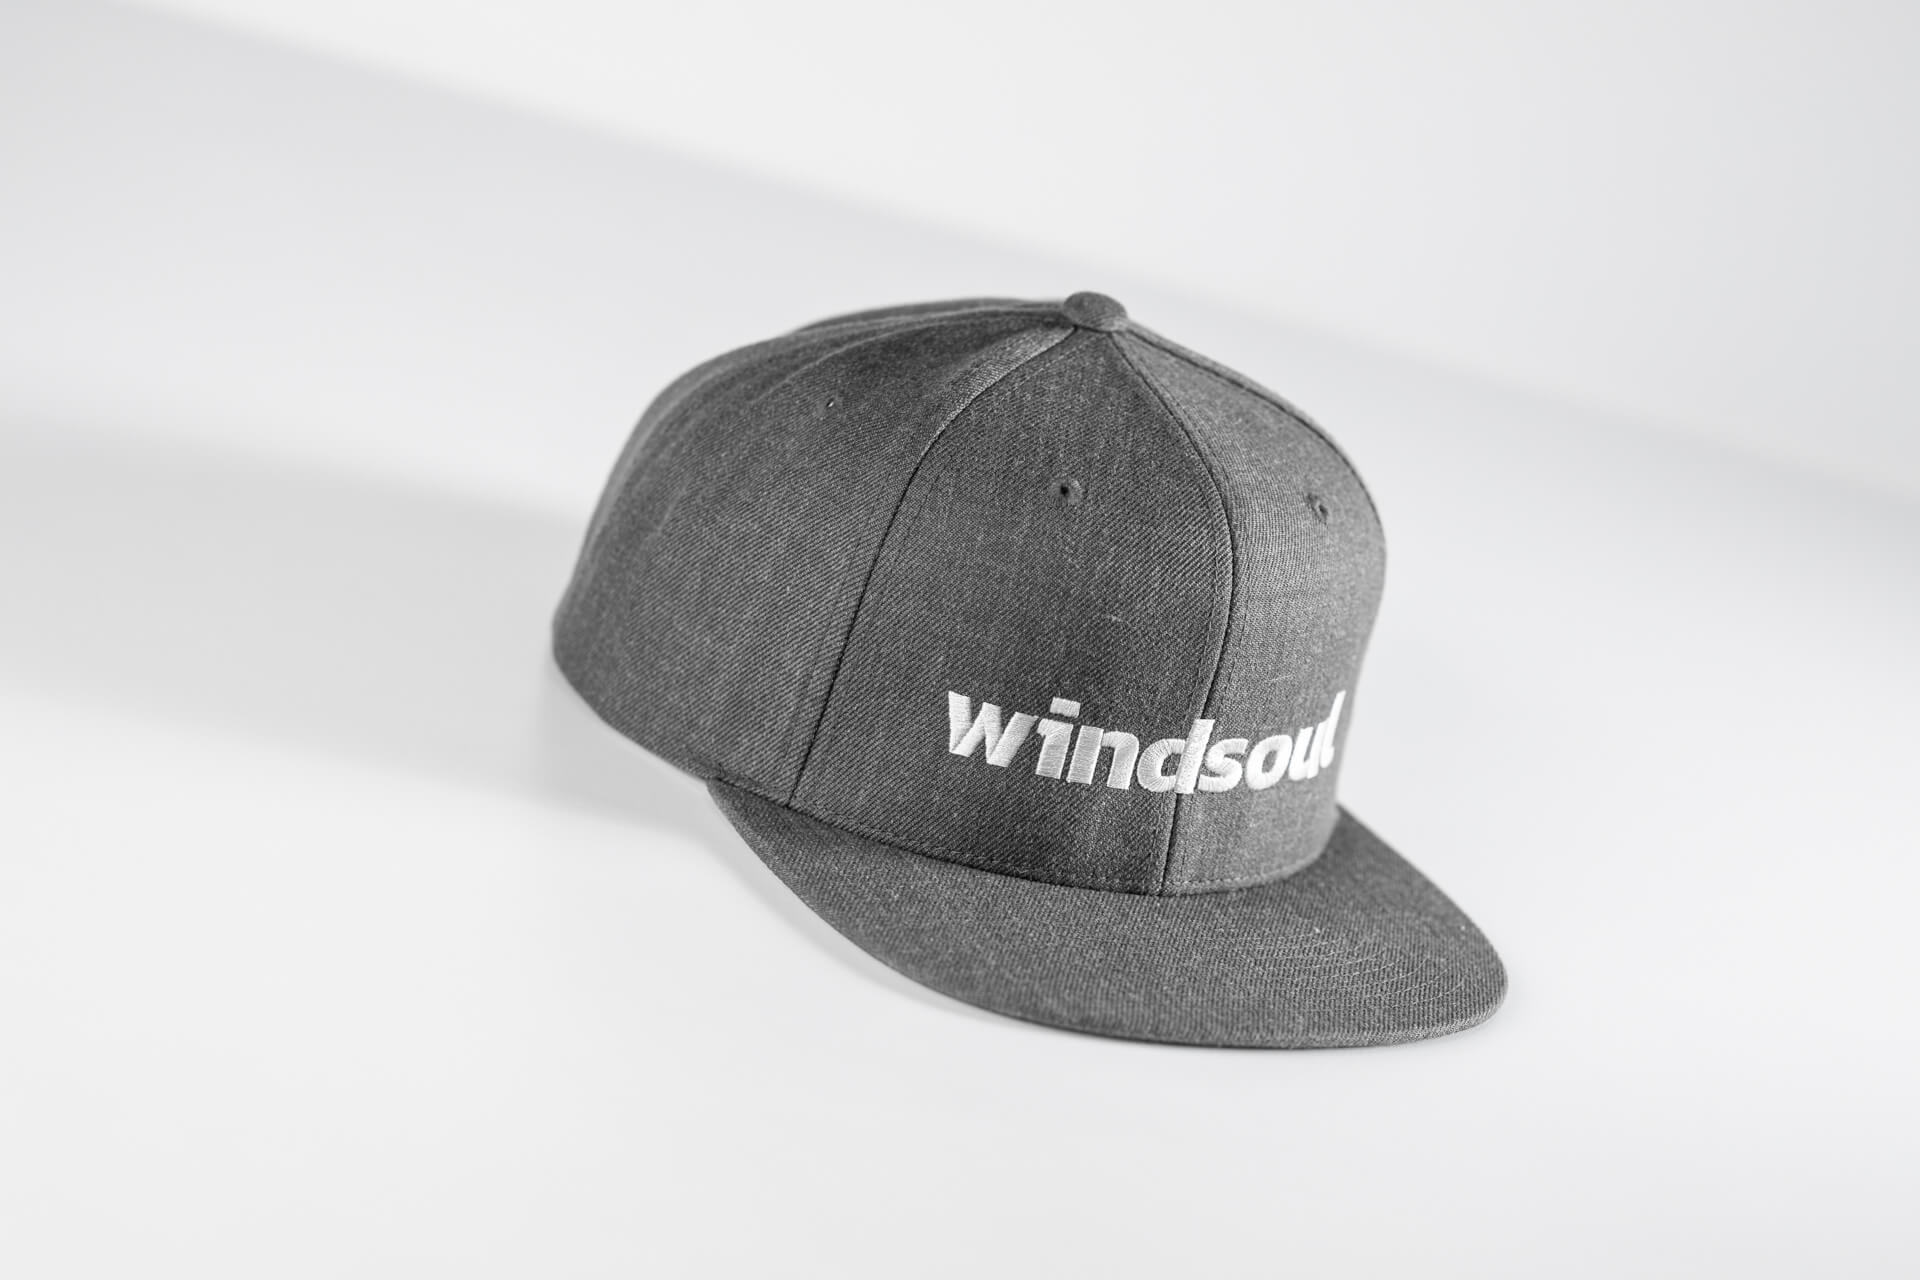 Windsoul